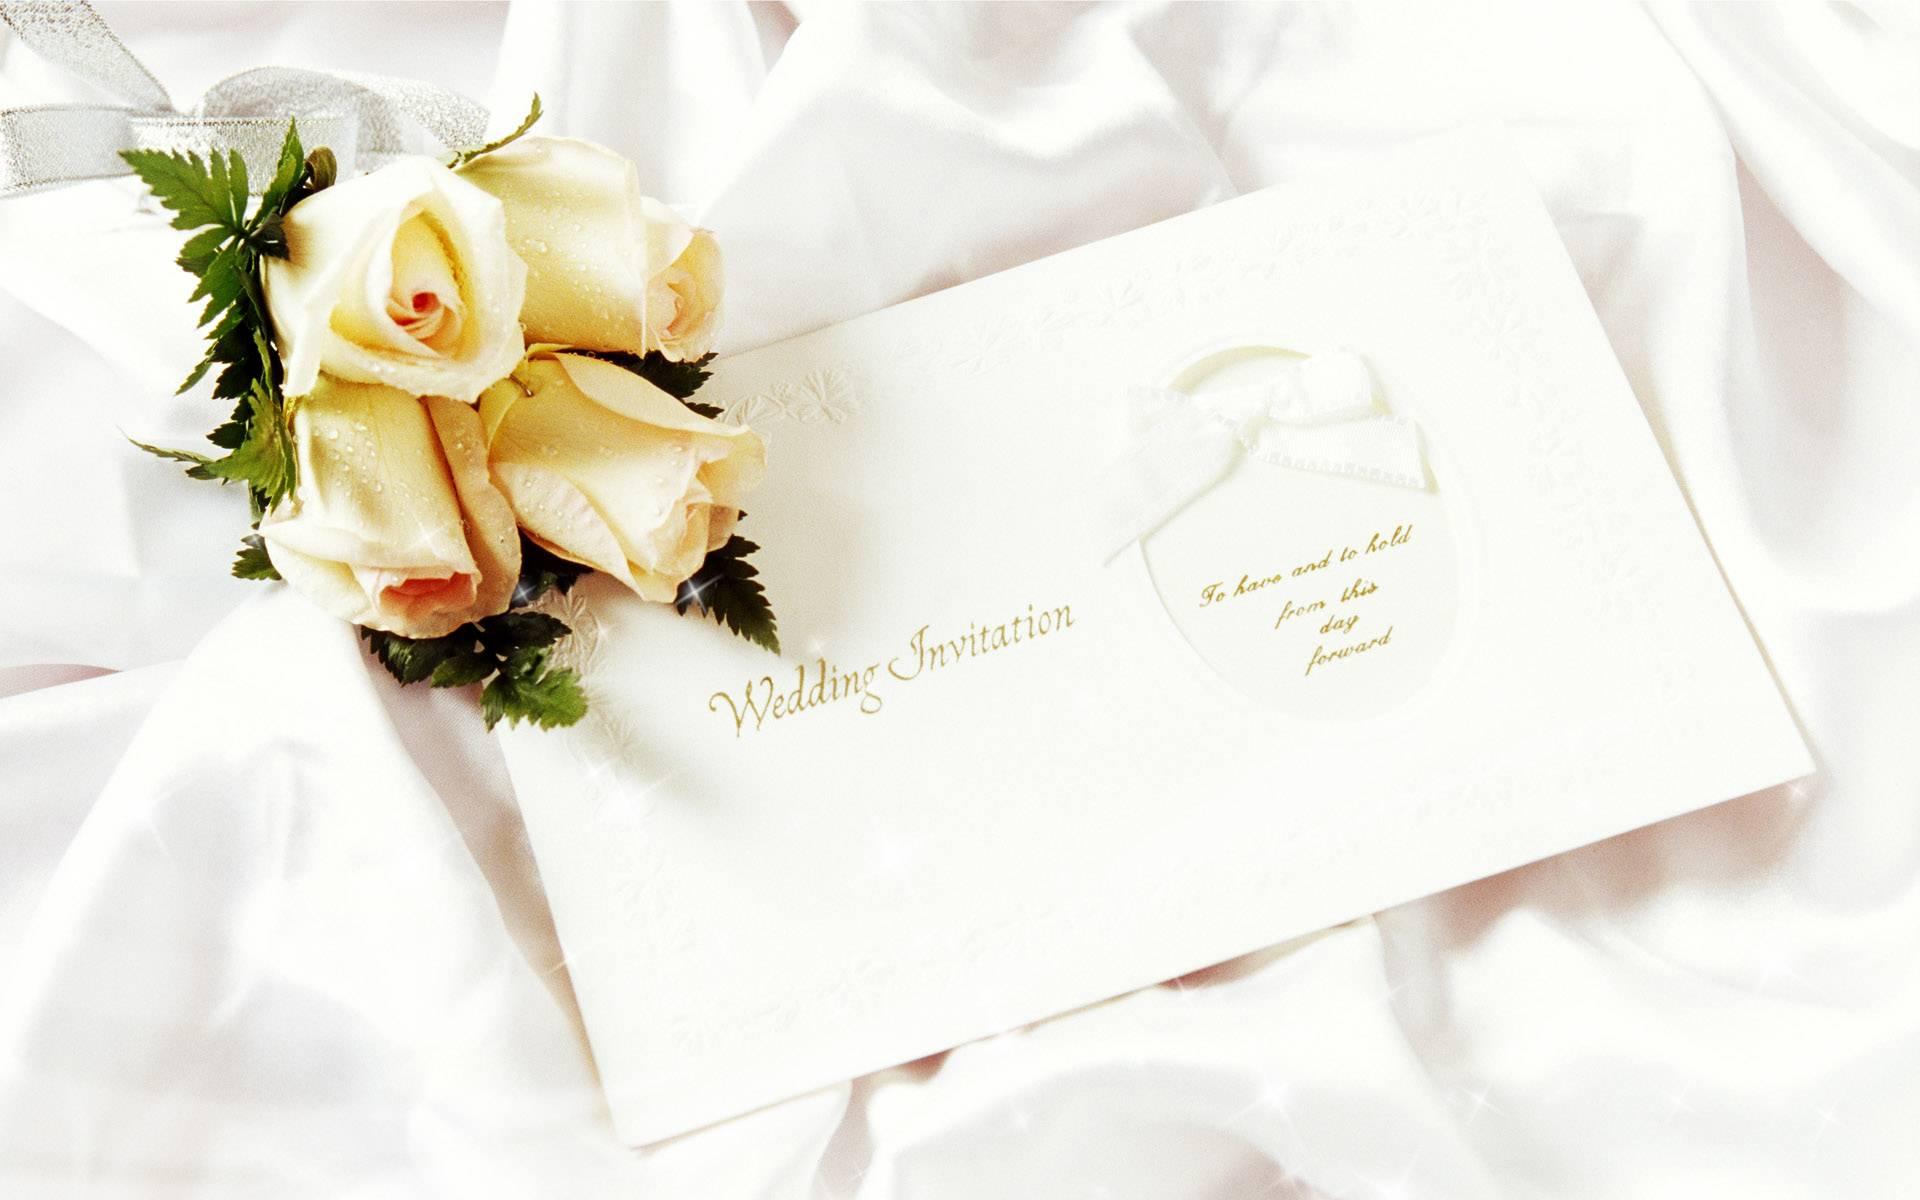 jq8WiR wedding background images wallpapersafari,Wallpaper For Wedding Invitation